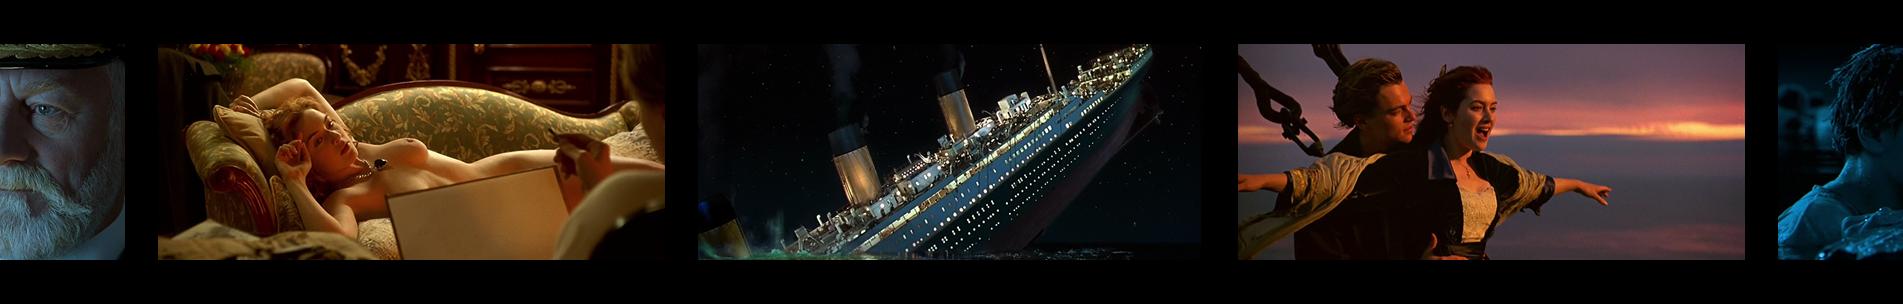 "Pellicule ""Titanic"""